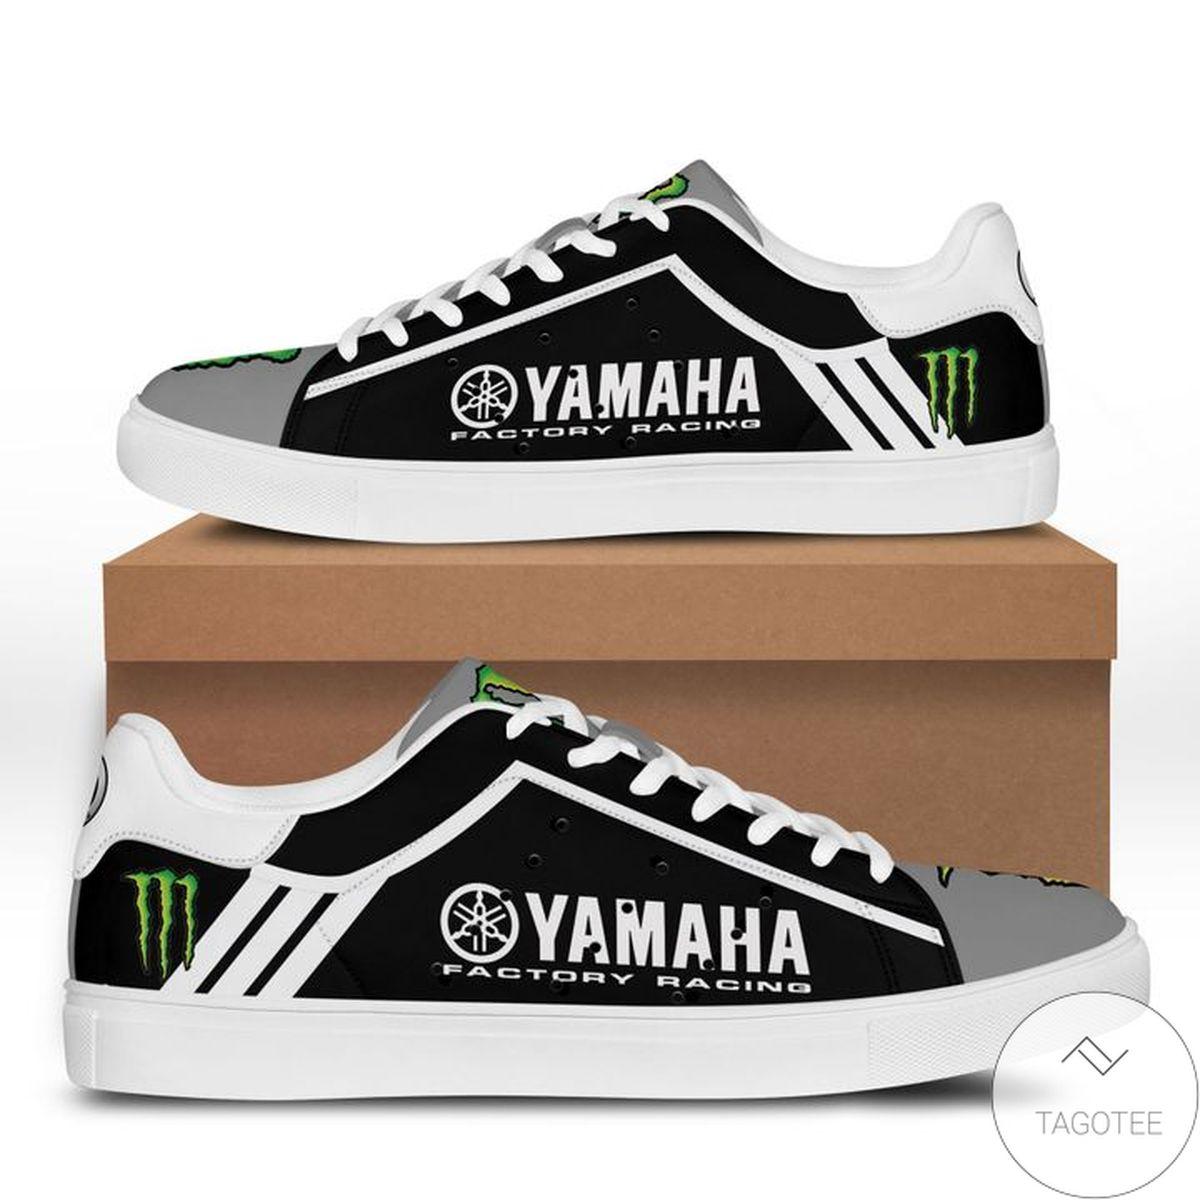 Fast Shipping Yamaha Racing Monster Black Stan Smith Shoes